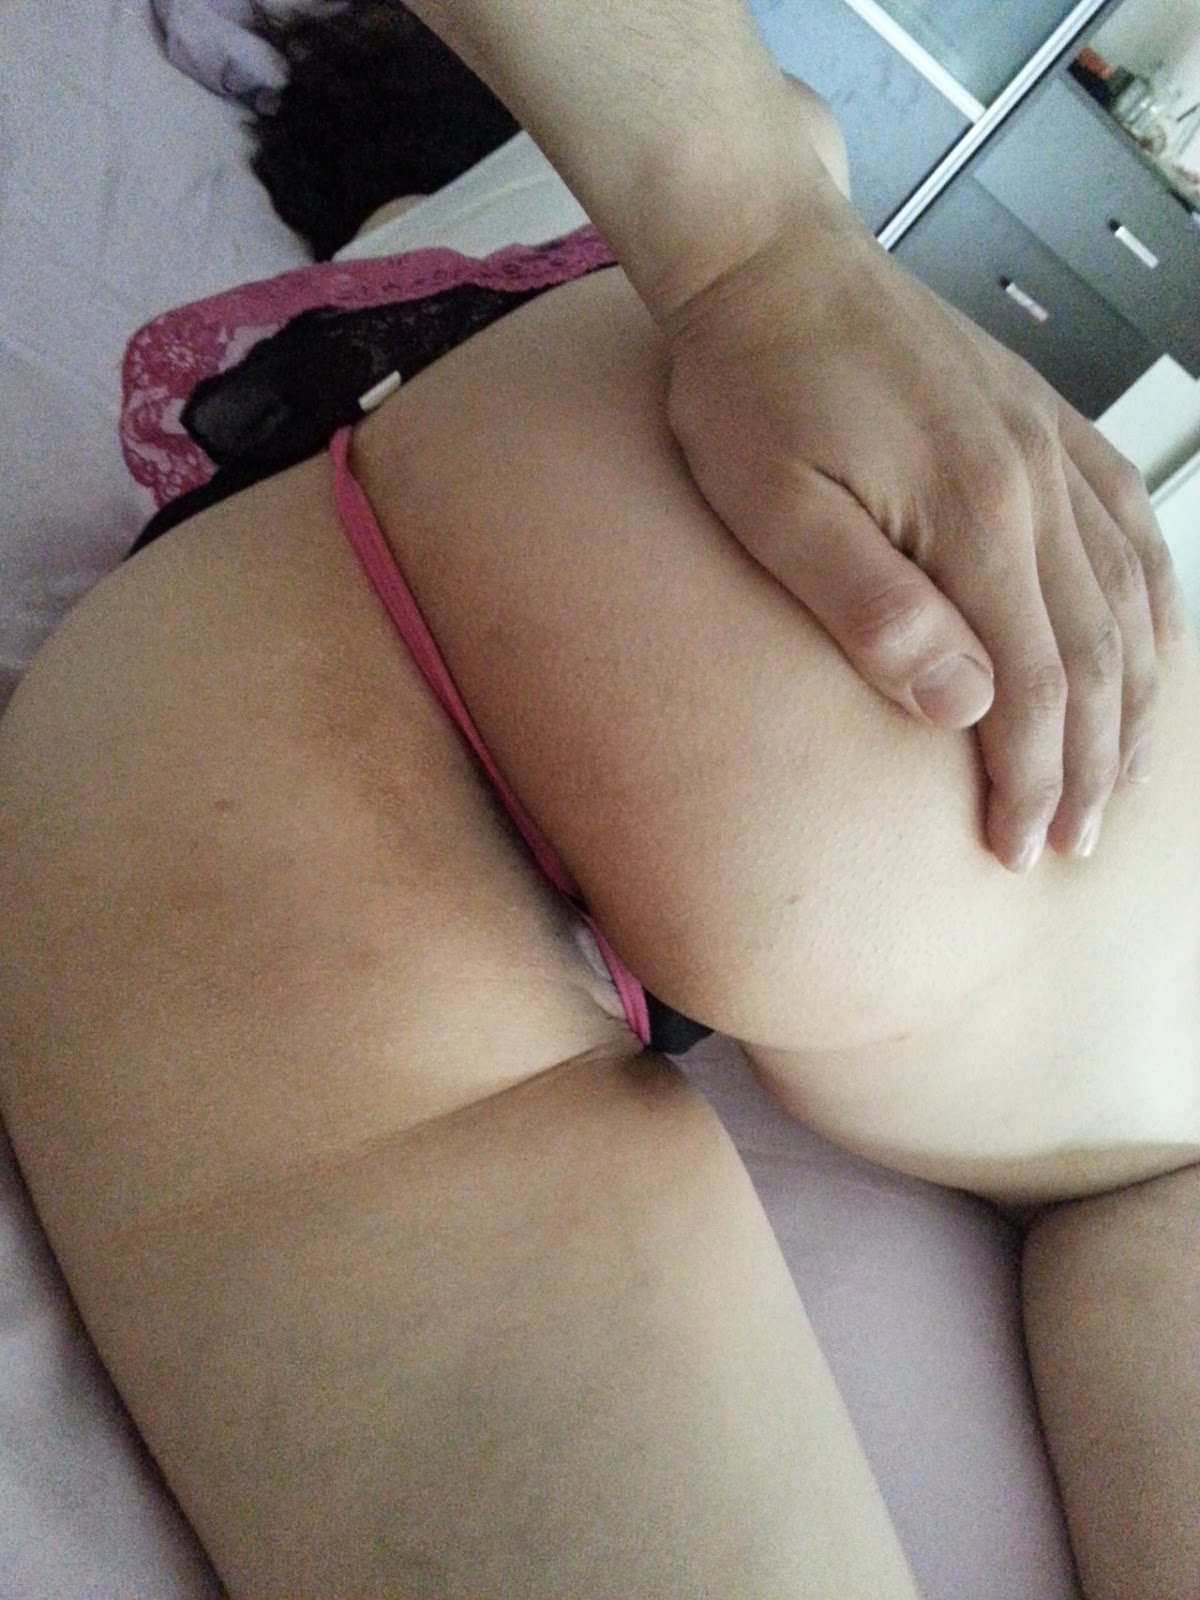 Banyoda Gizli Masturbasyon  XXX Hit  302 Videolar